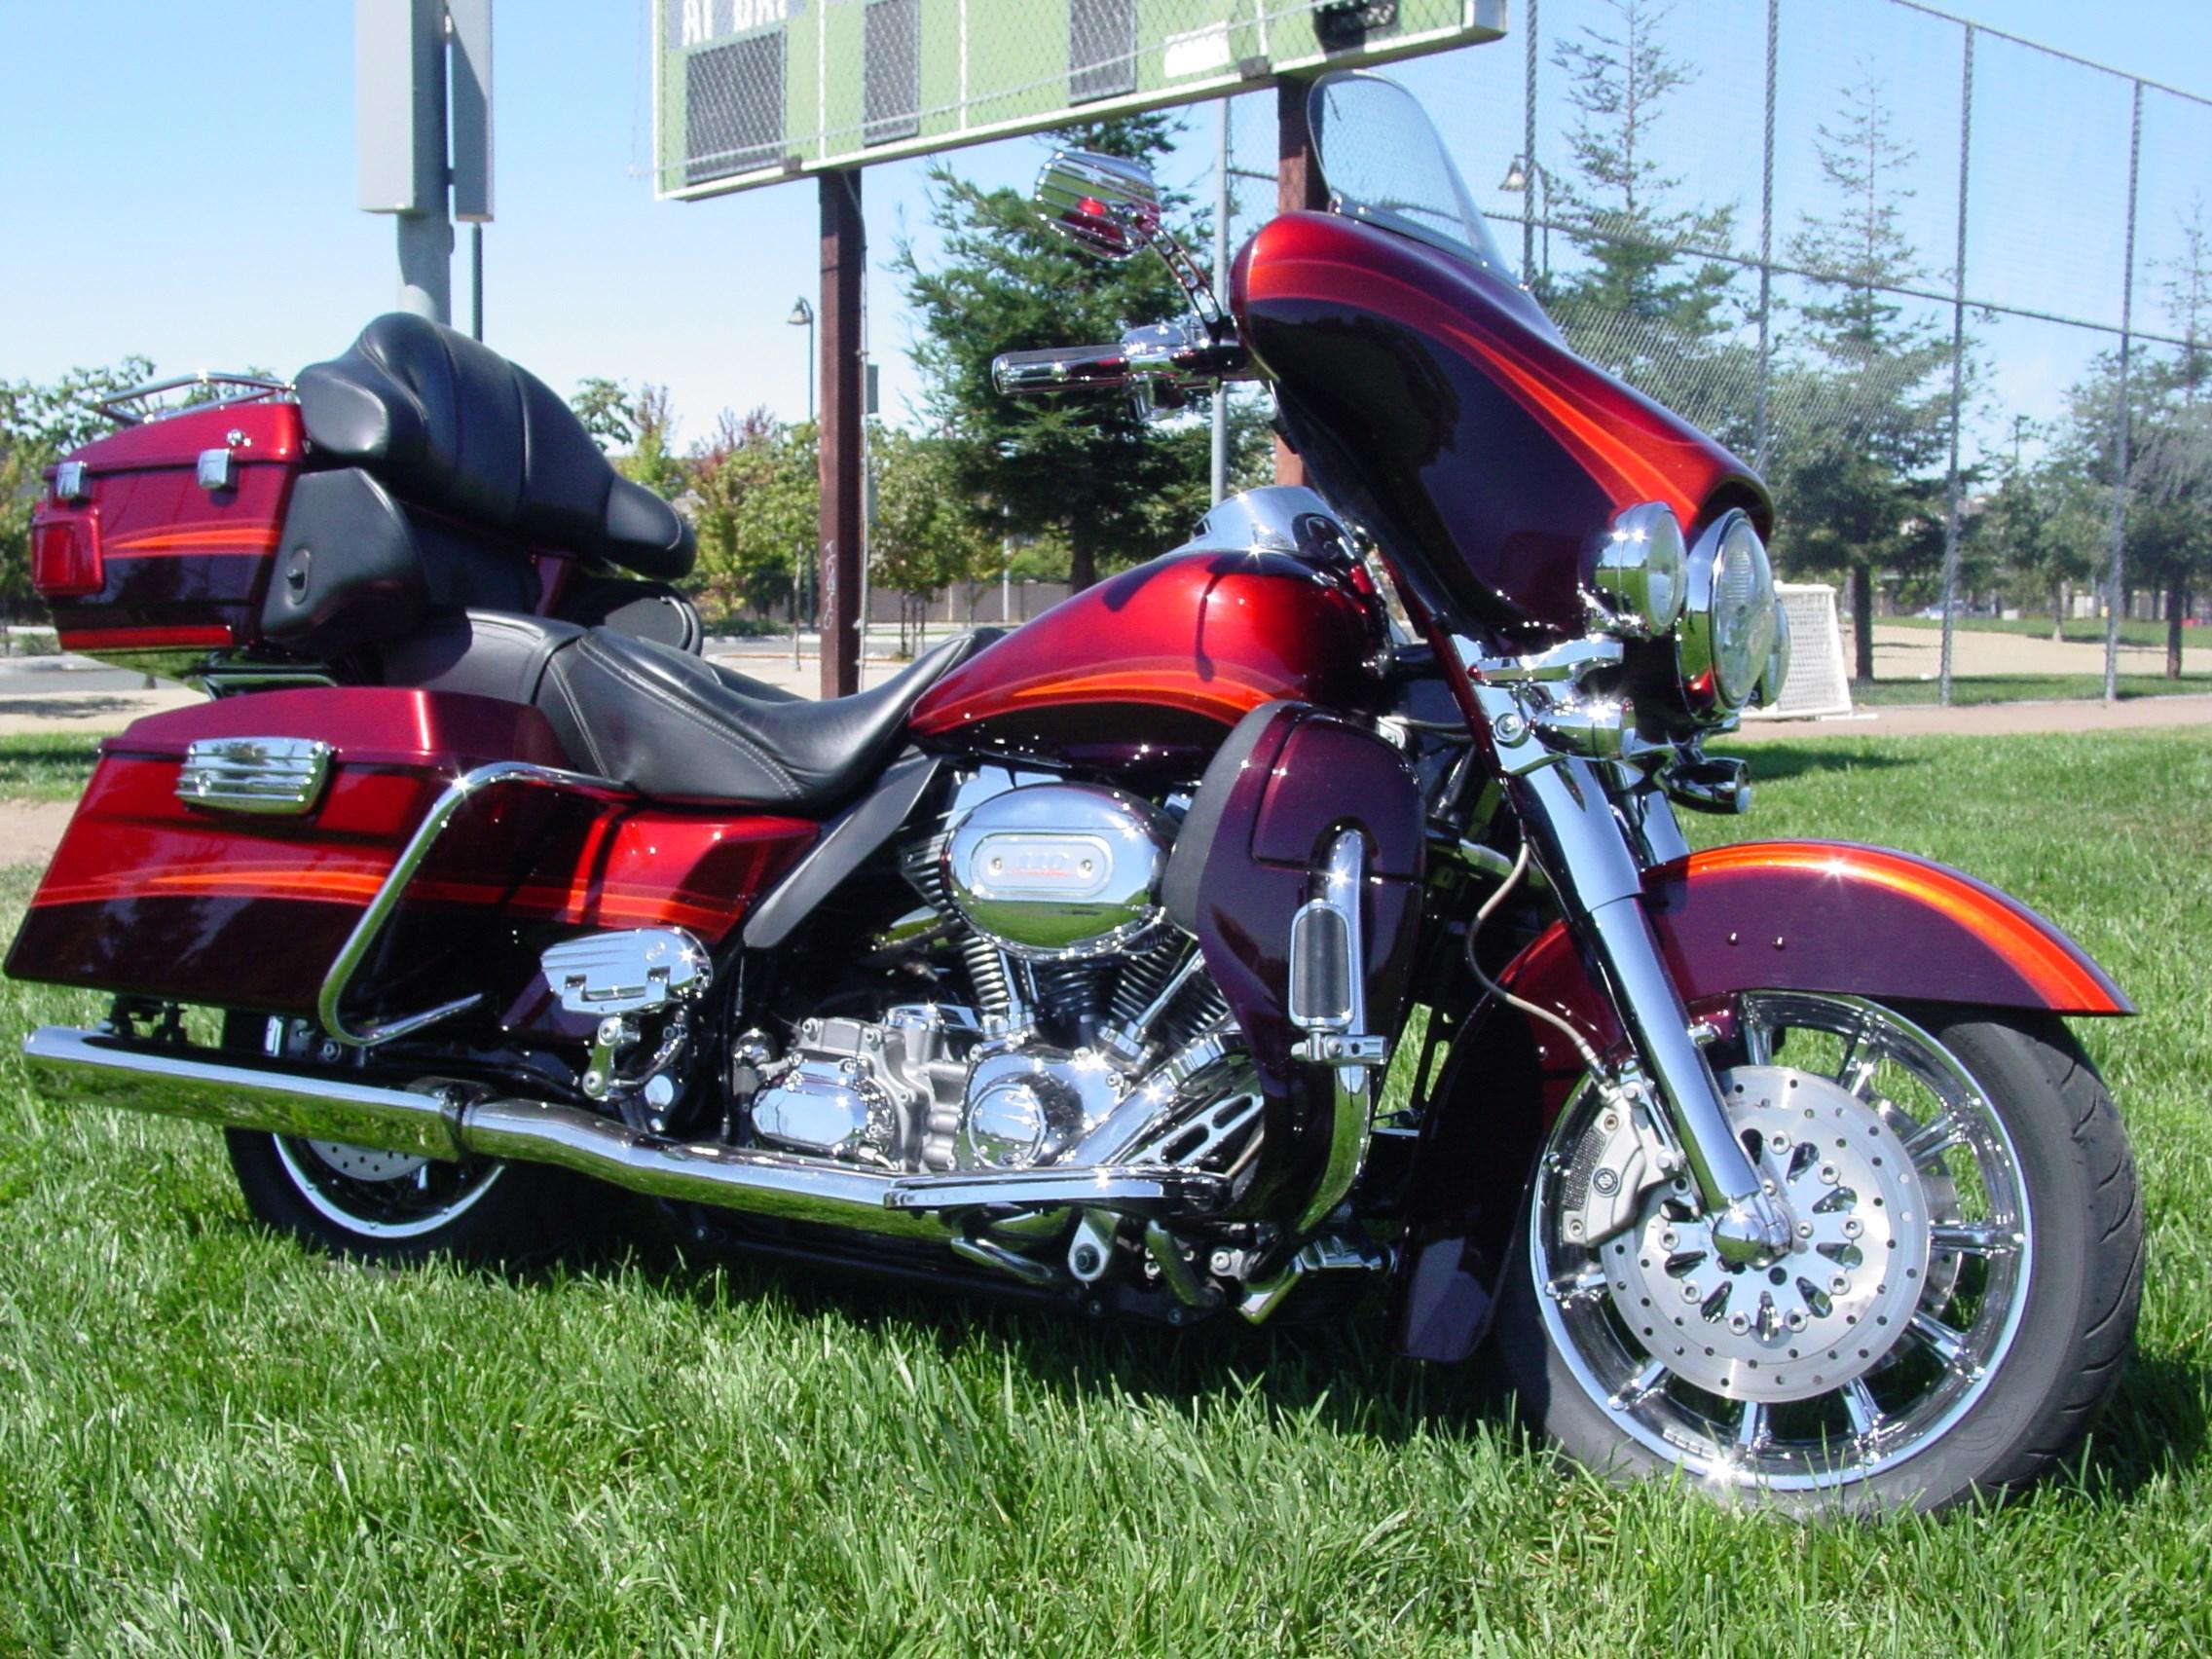 2009 Harley Davidson 174 Flhtcuse4 Cvo Ultra Classic